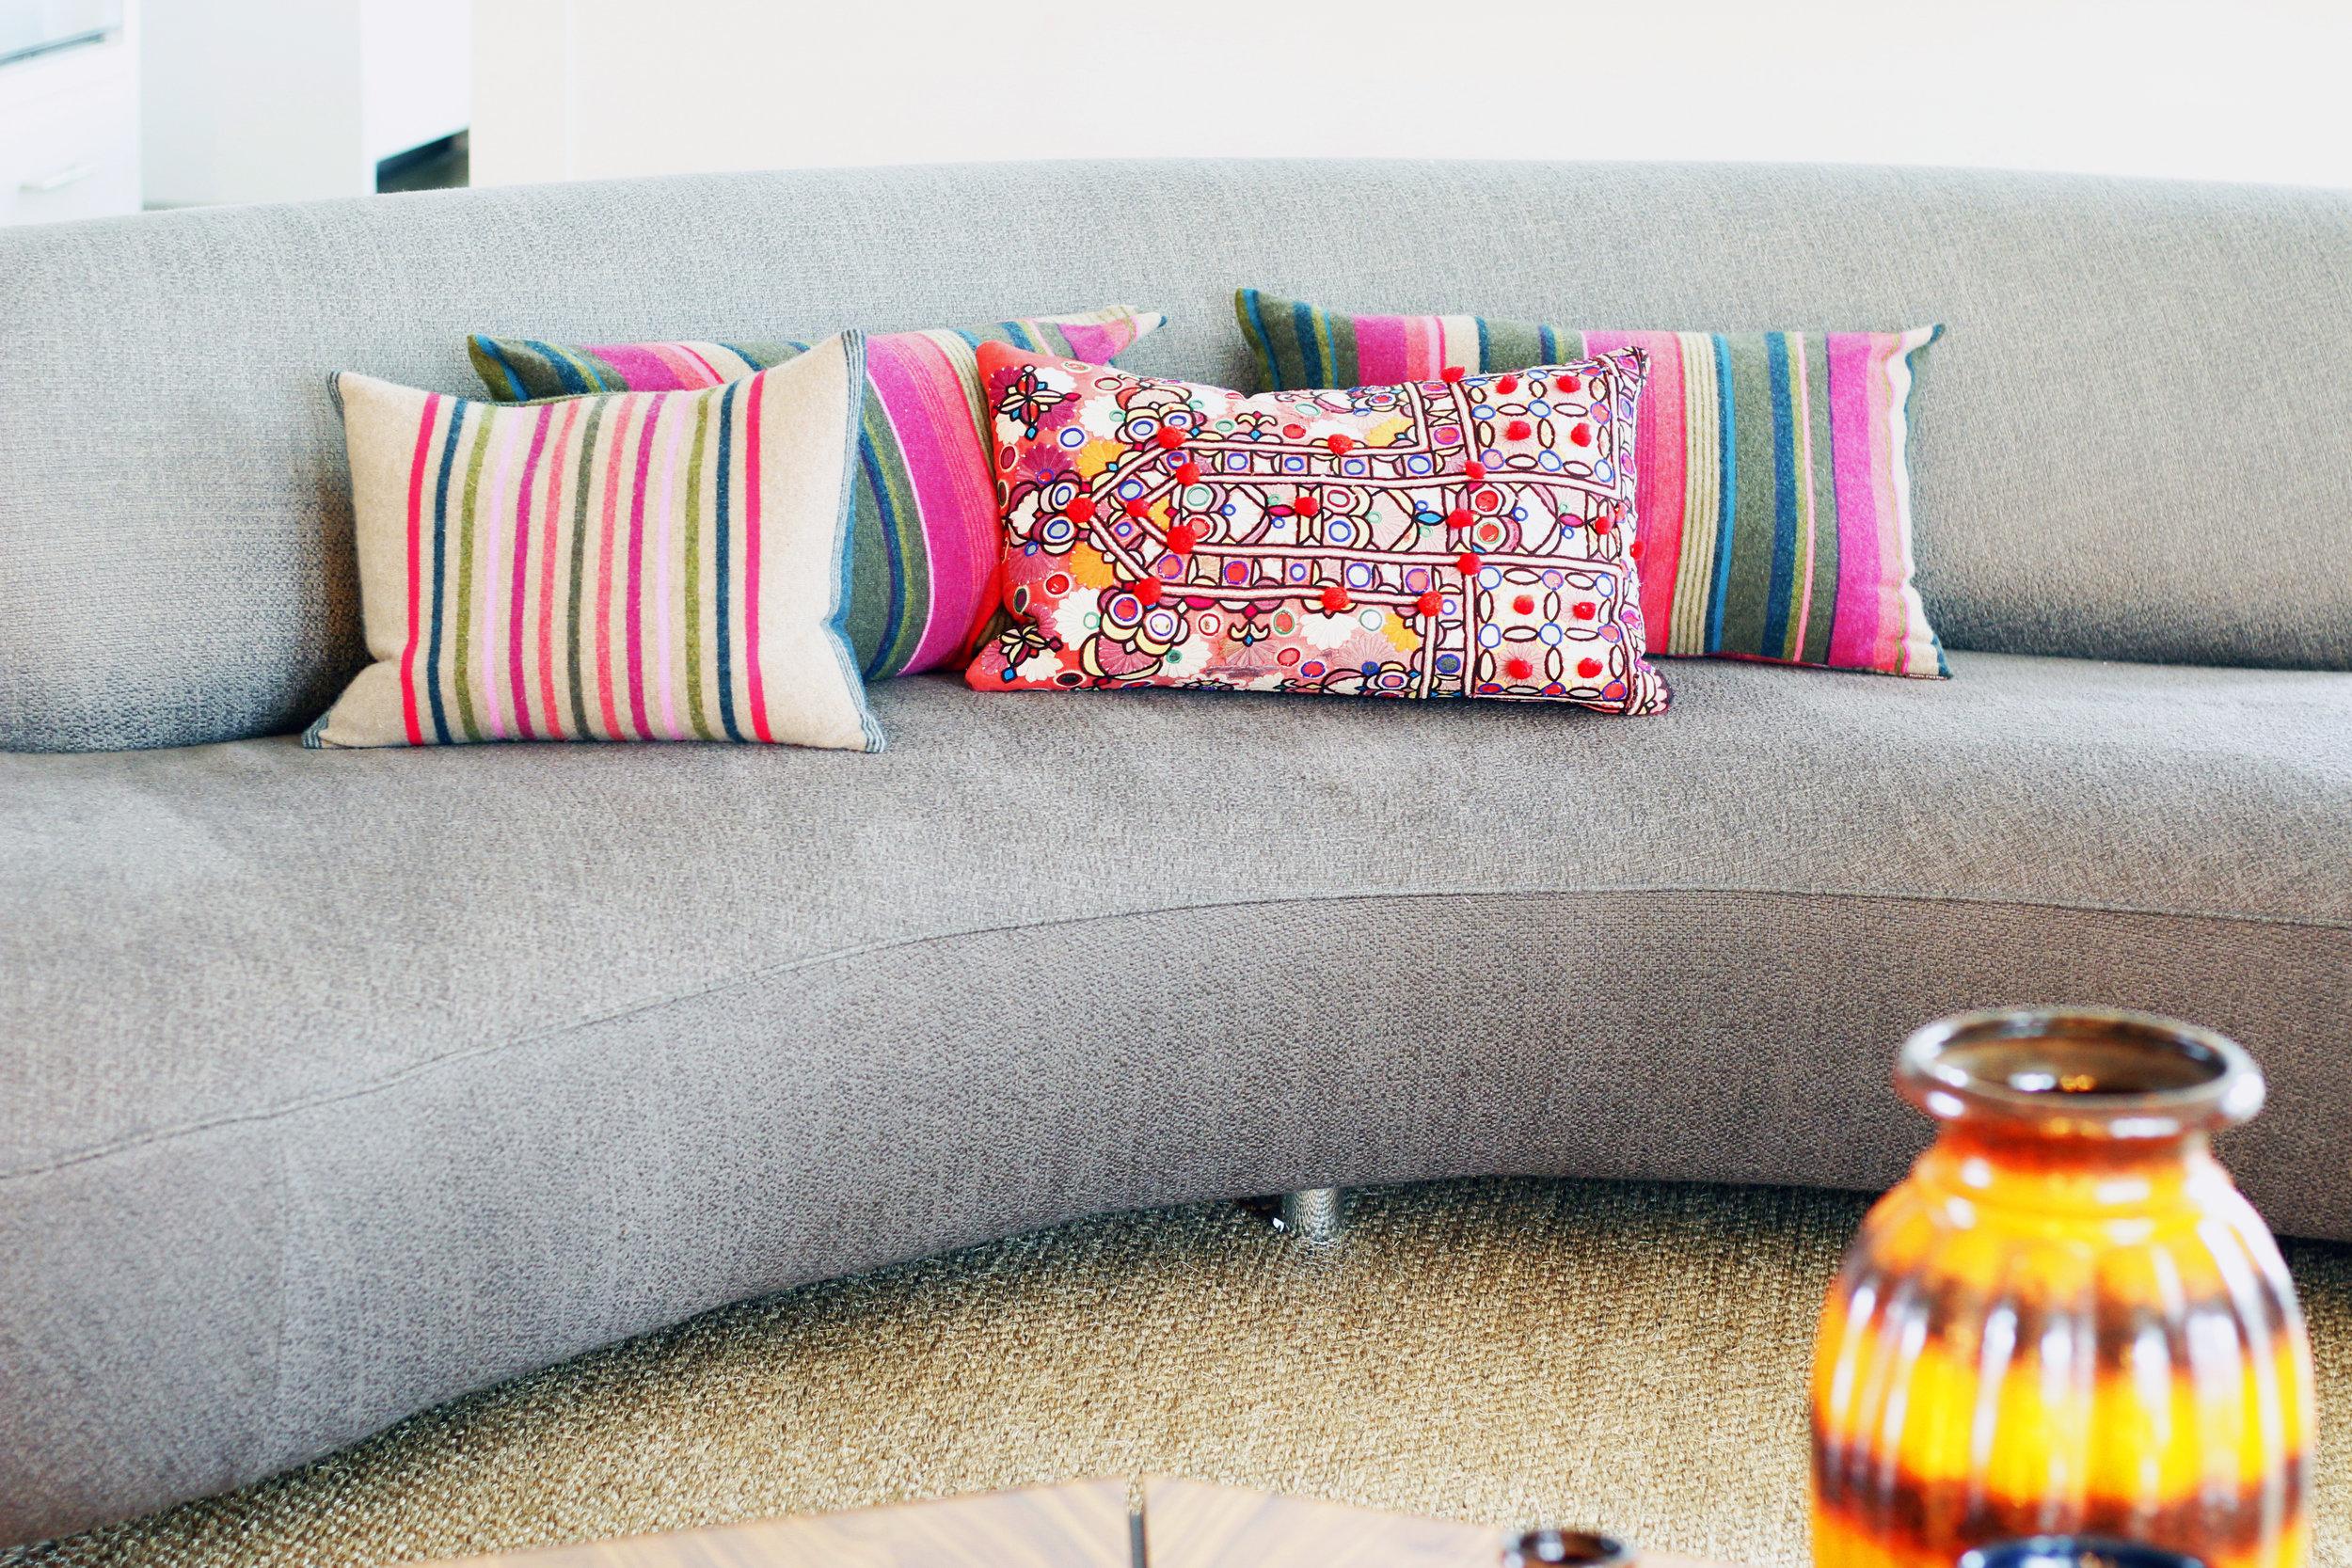 Nana Cunha - 4 Living room detail f.jpg